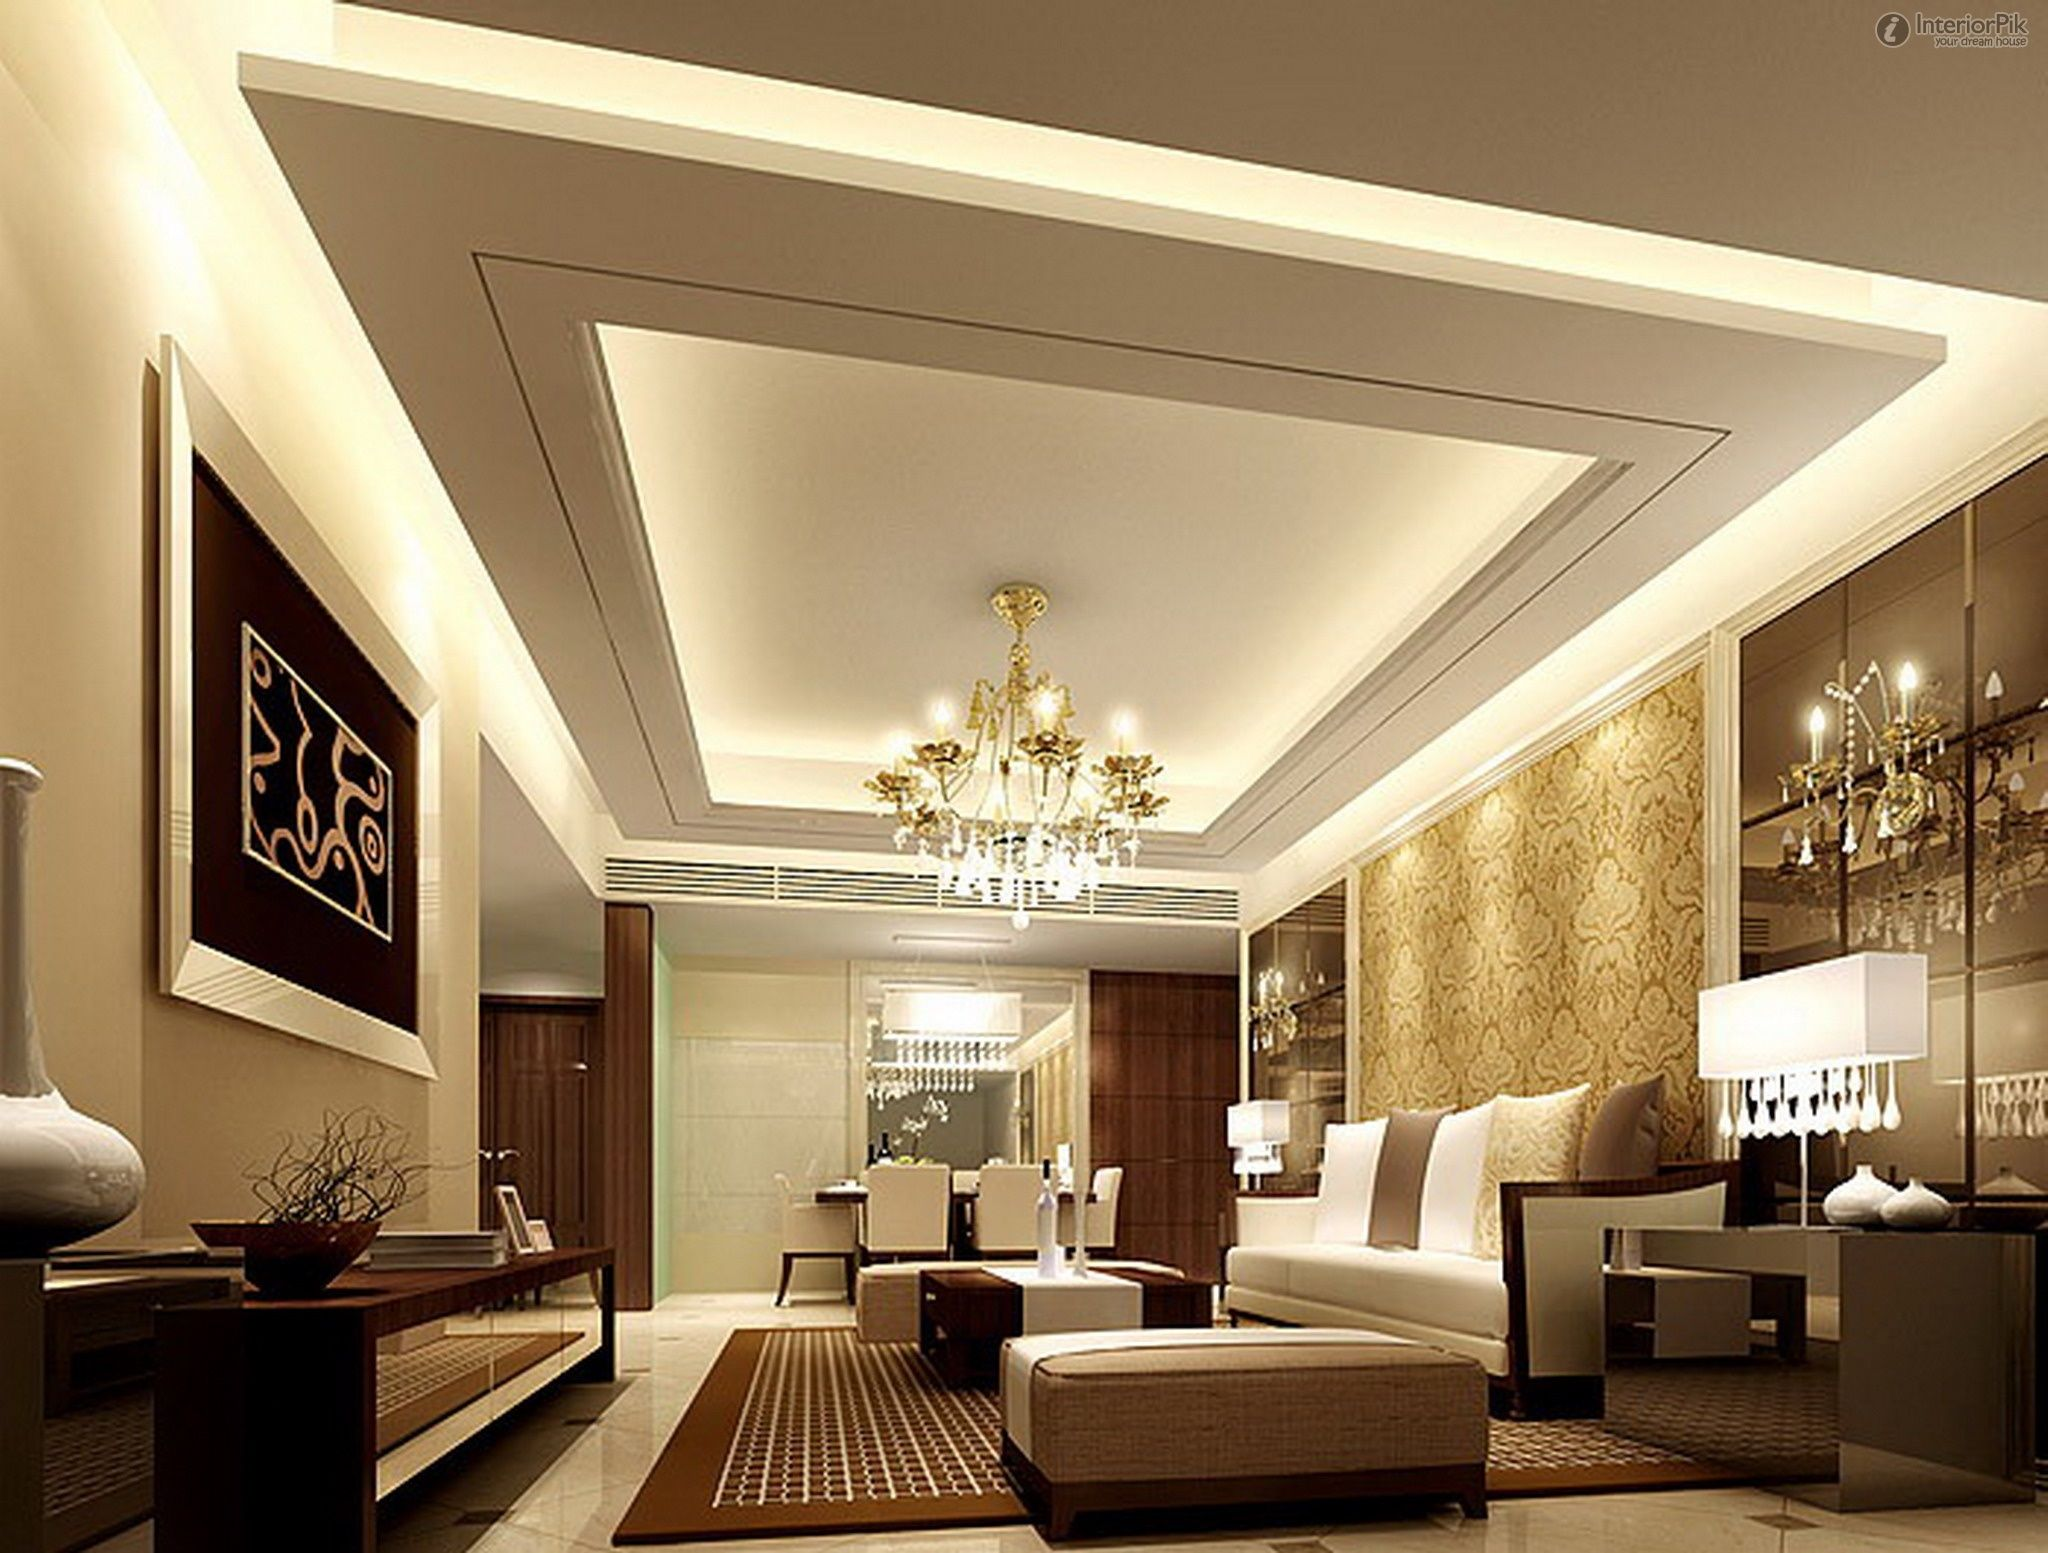 Fresco of Vaulted Living Room Ideas  Interiors  Gypsum ceiling design Simple false ceiling